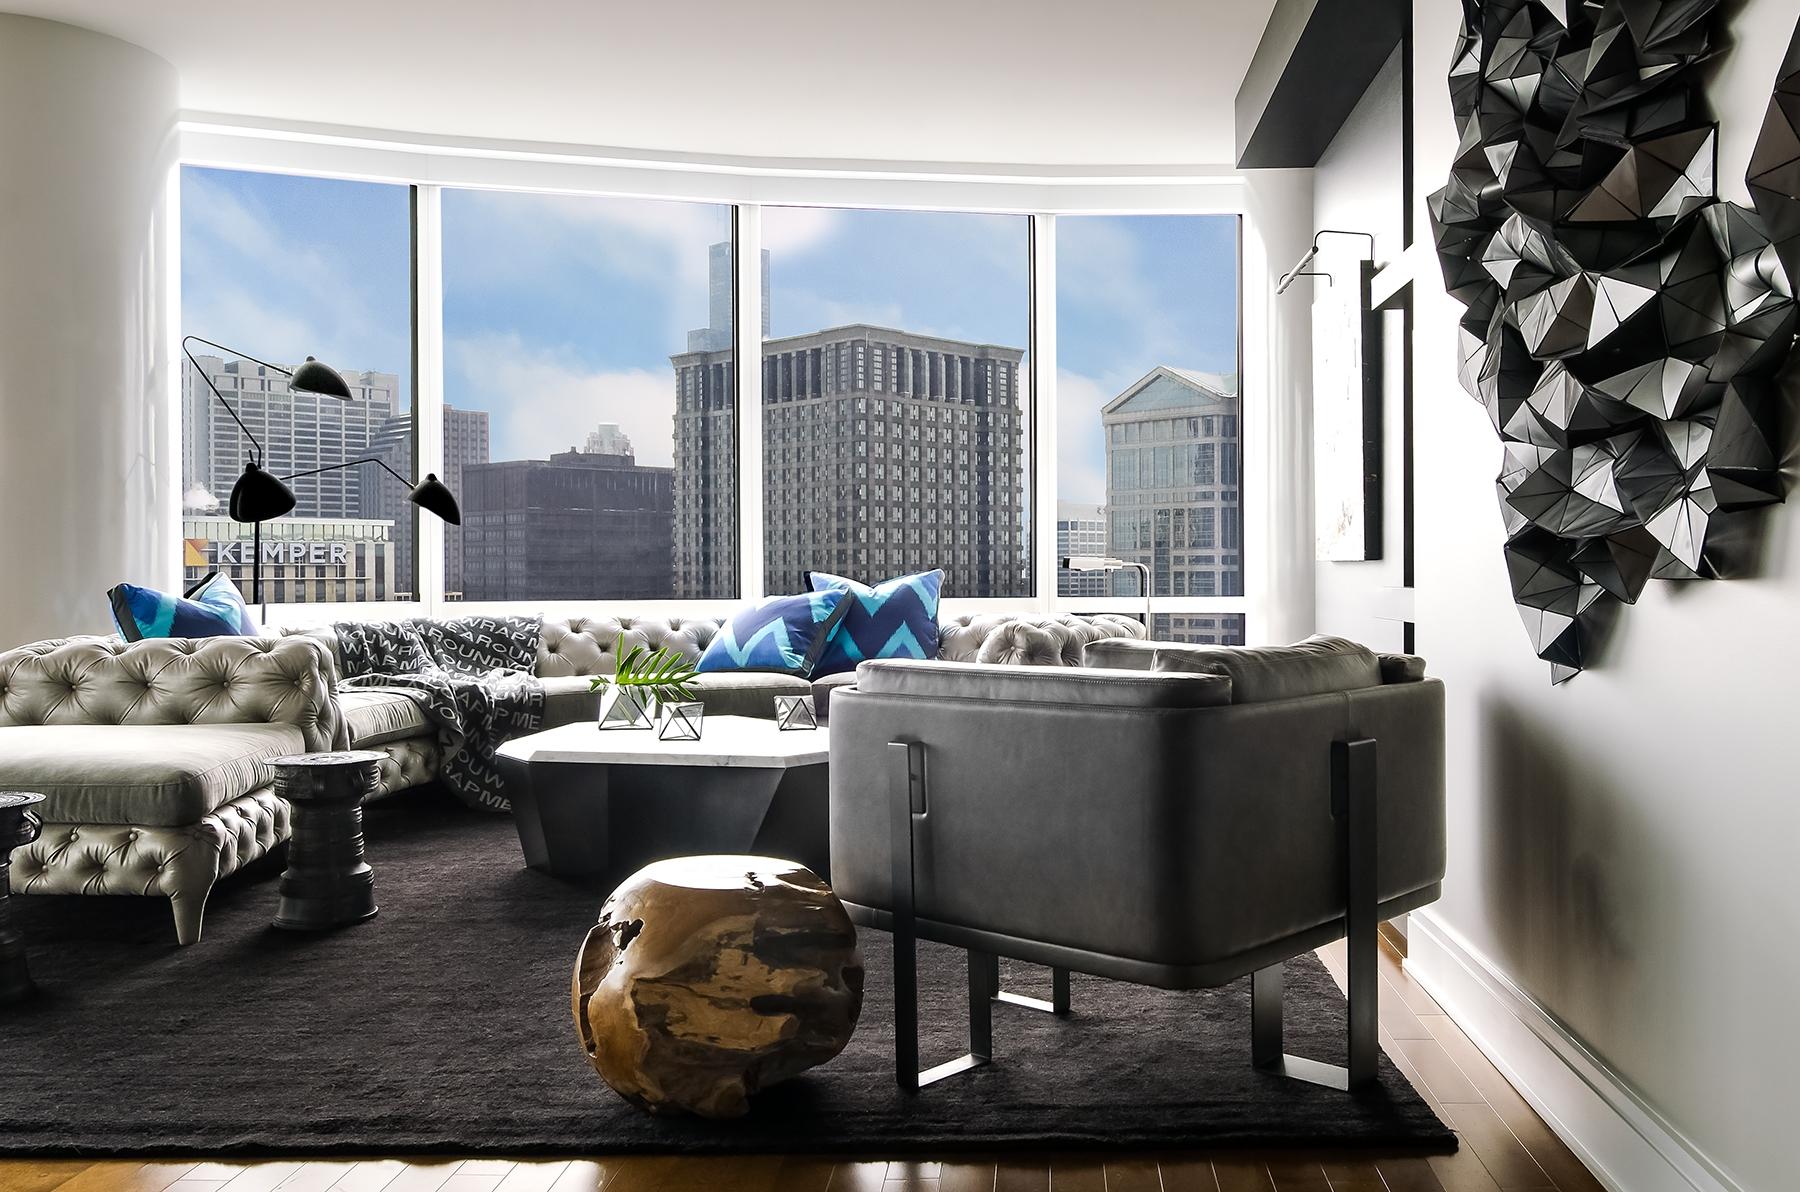 tsp profile aimee wertepny of project. Black Bedroom Furniture Sets. Home Design Ideas